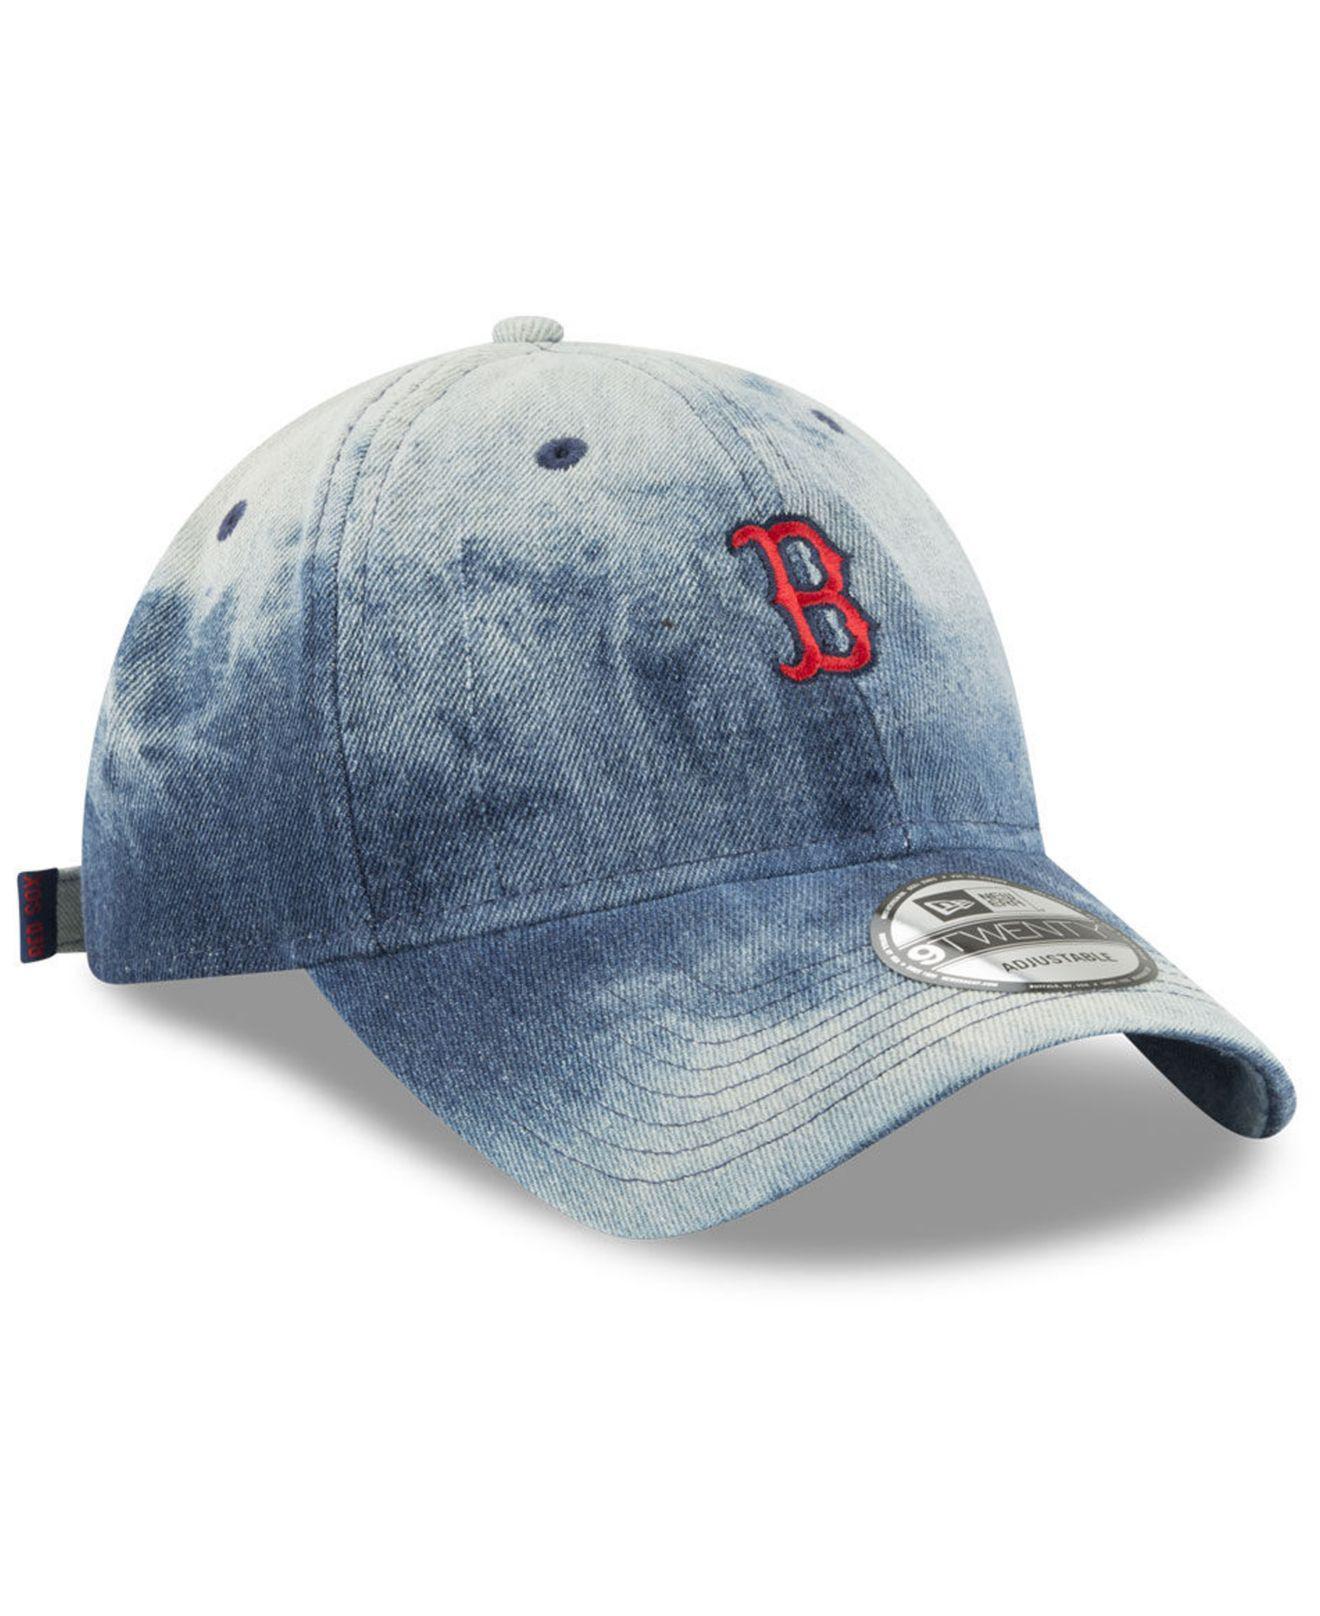 new styles a25a1 6fc44 ... new era 9twenty mlb rugged canvas adjustable hat 27eda d8845  cheapest  lyst ktz boston red sox denim wash out 9twenty cap in blue for men a06fd